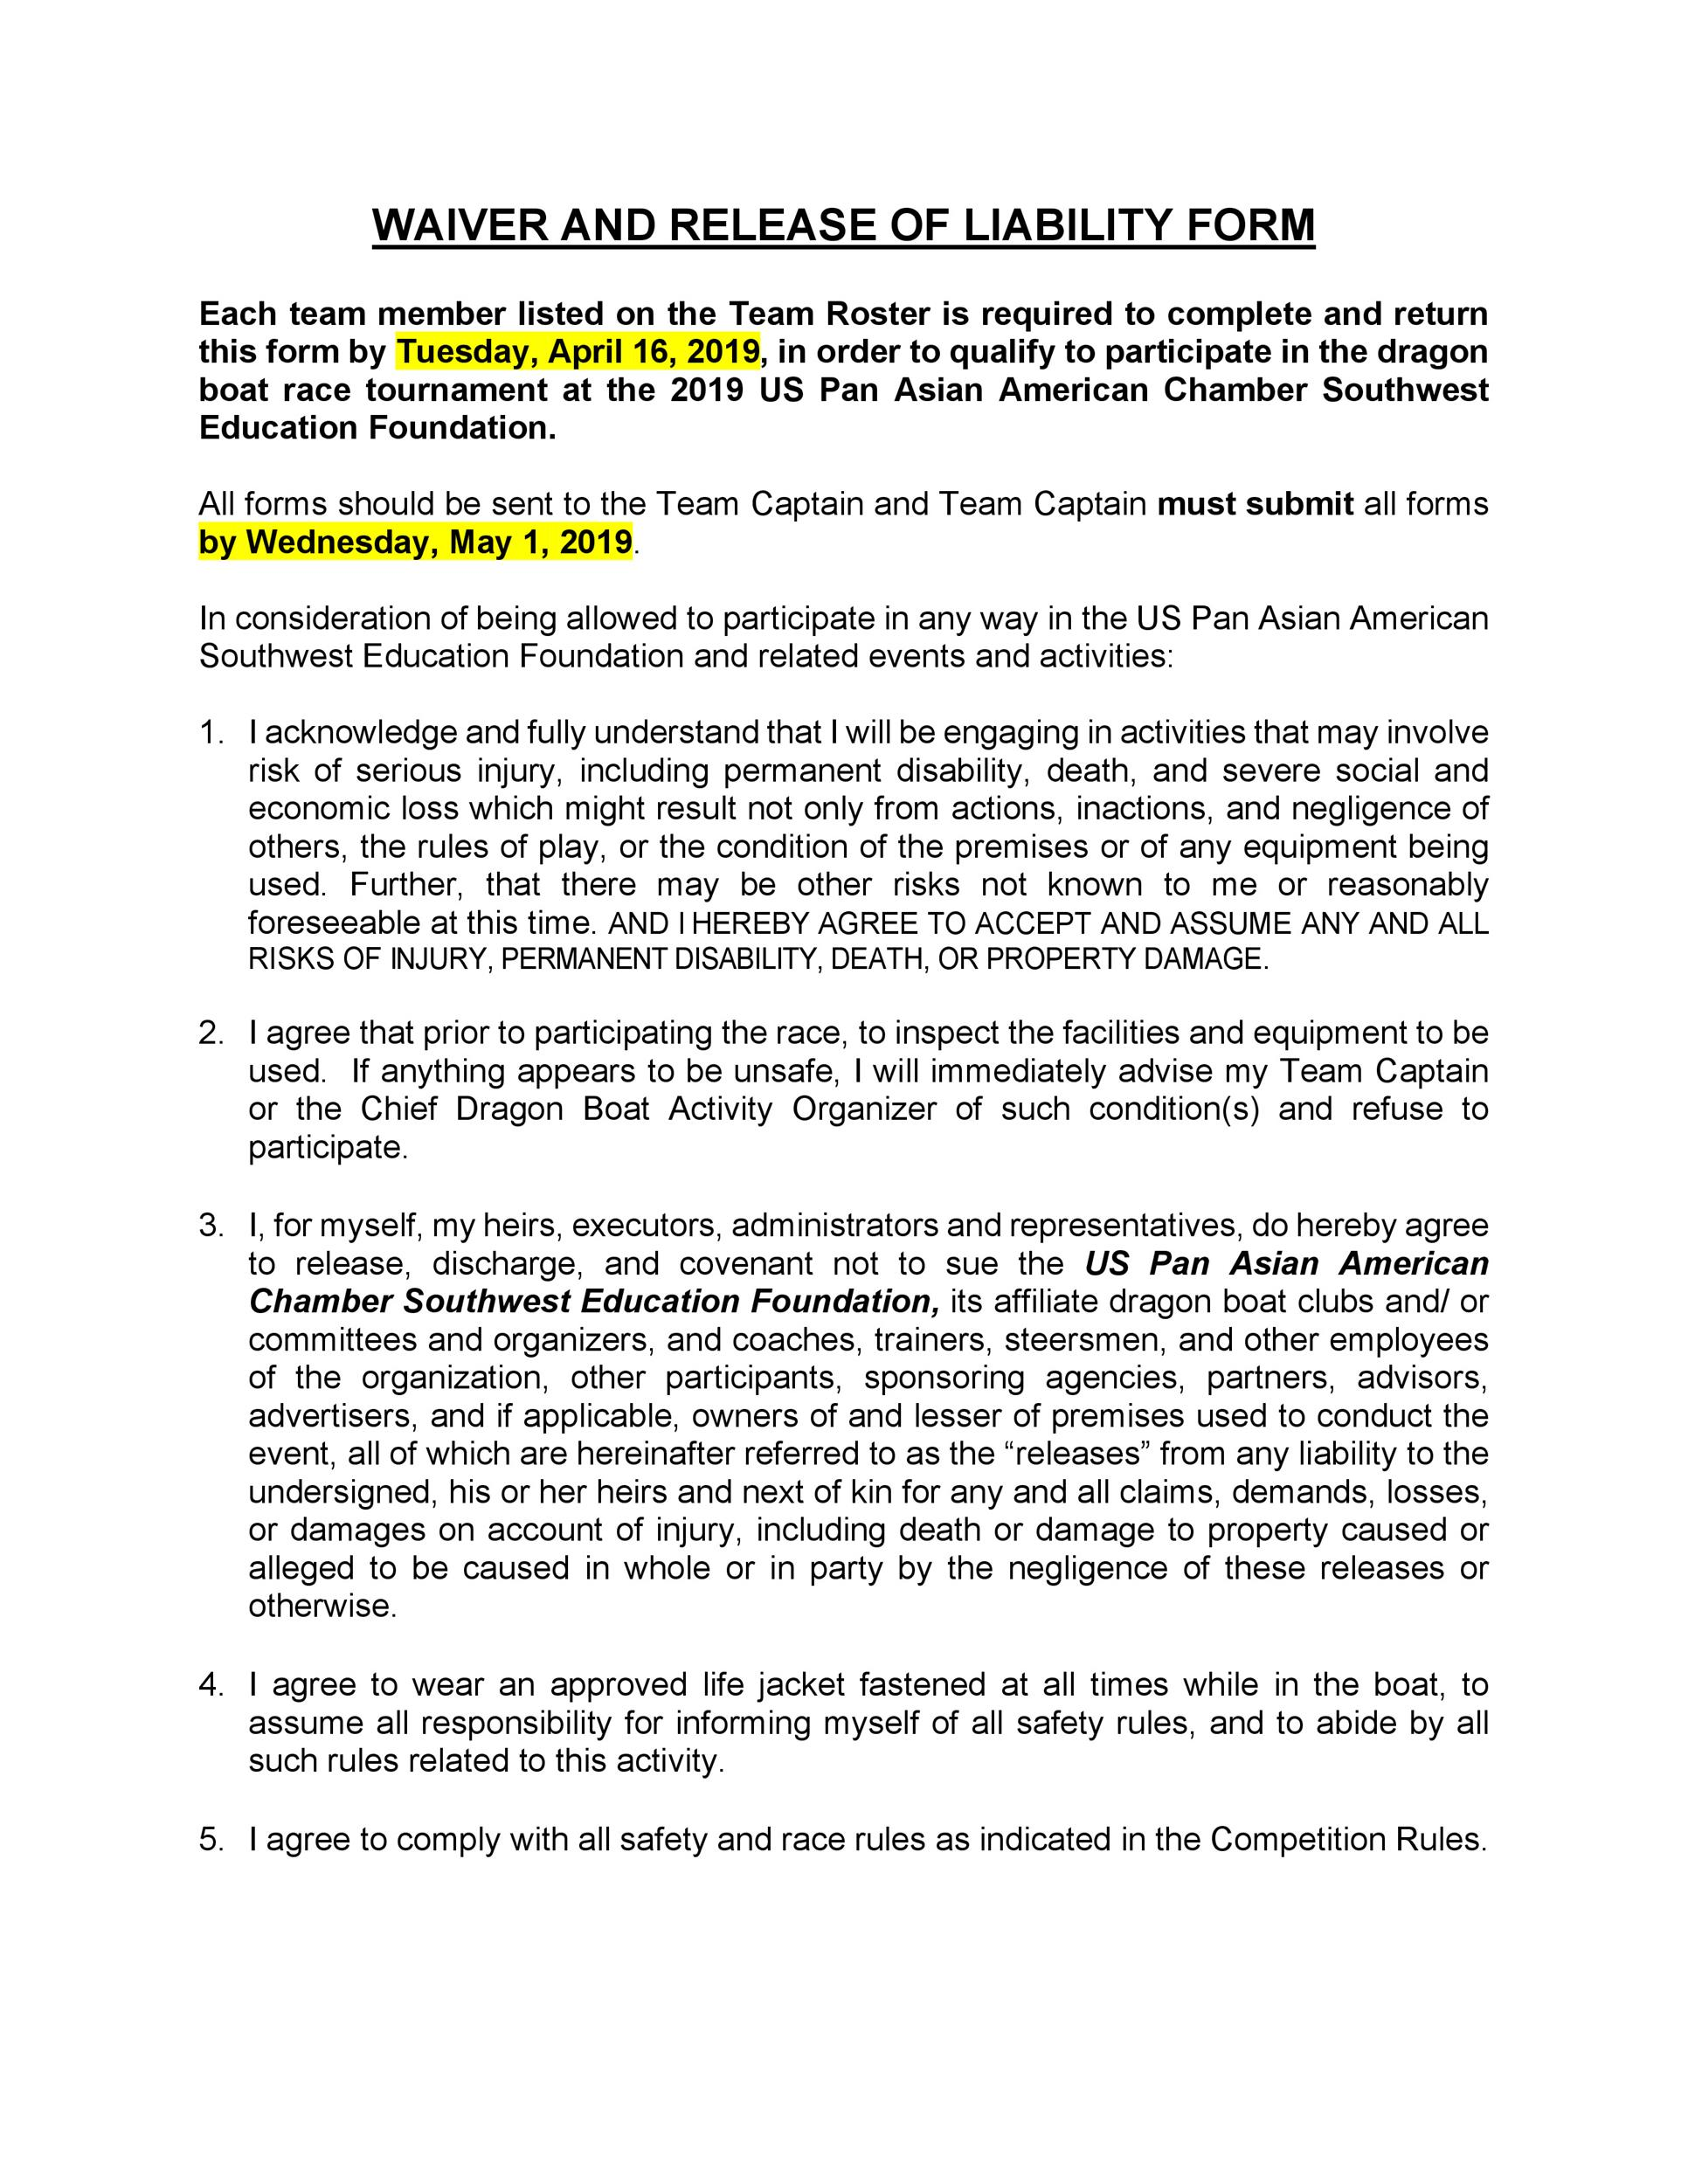 11 Liability Waiver Form Templates Pdf Doc Free